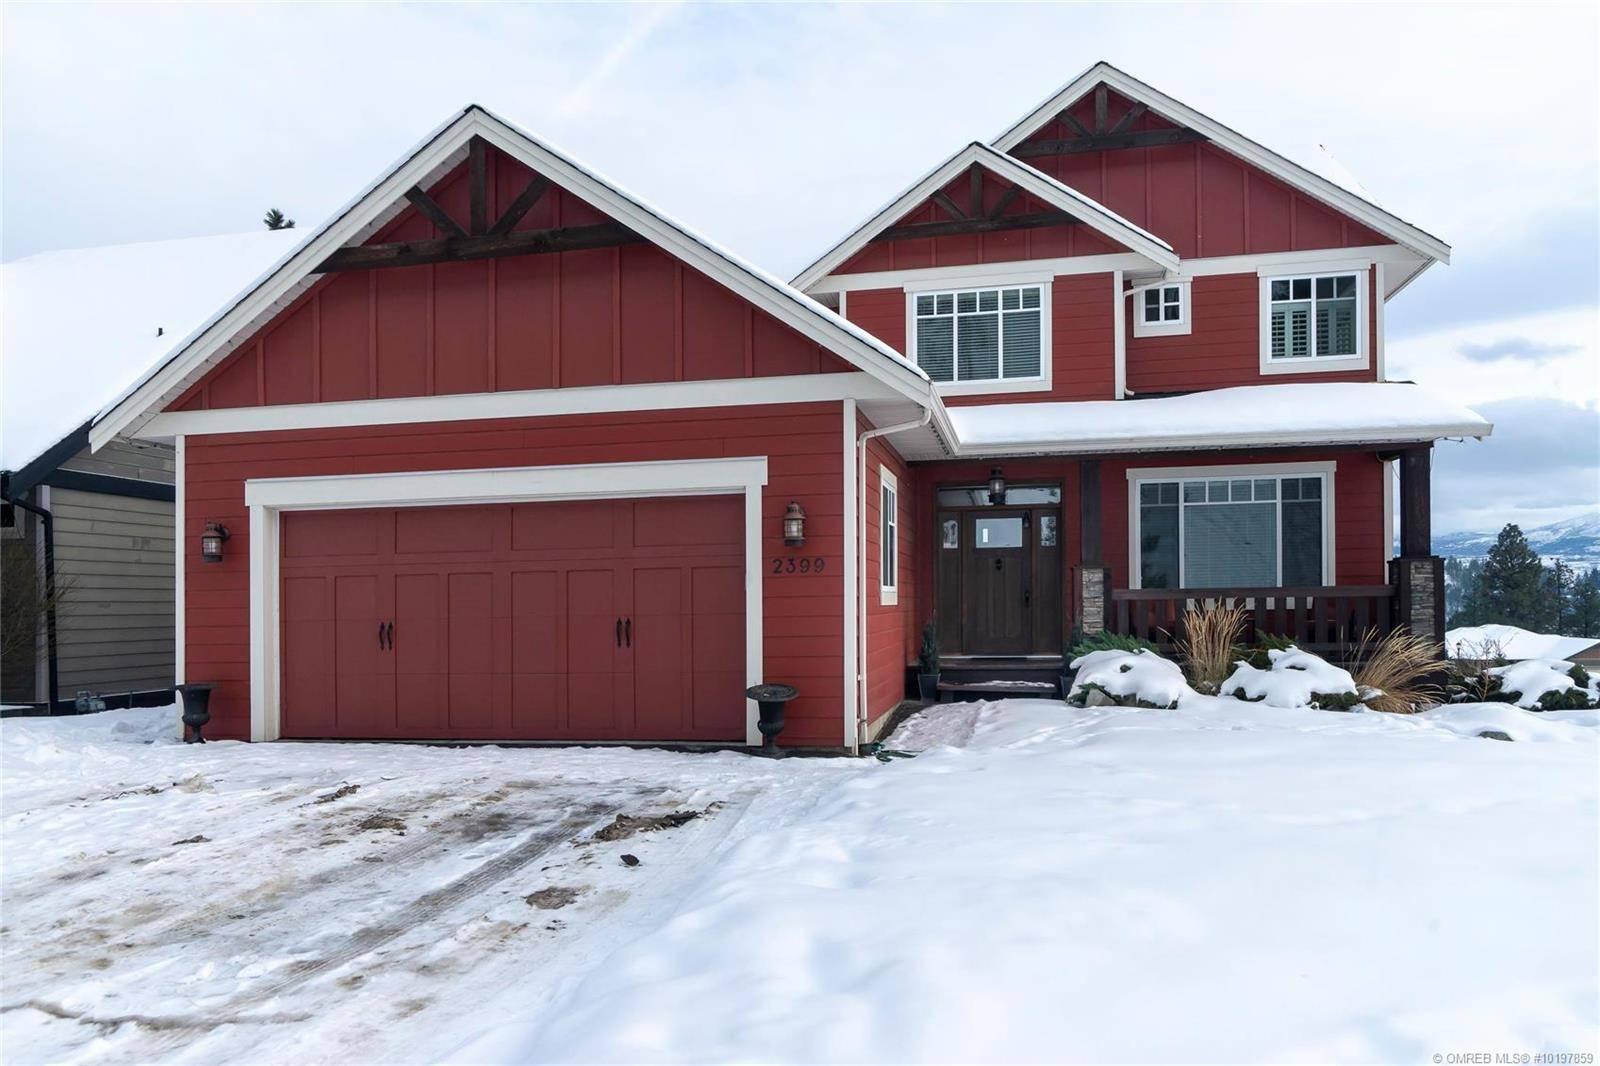 House for sale at 2399 Tallus Ridge Dr West Kelowna British Columbia - MLS: 10197859